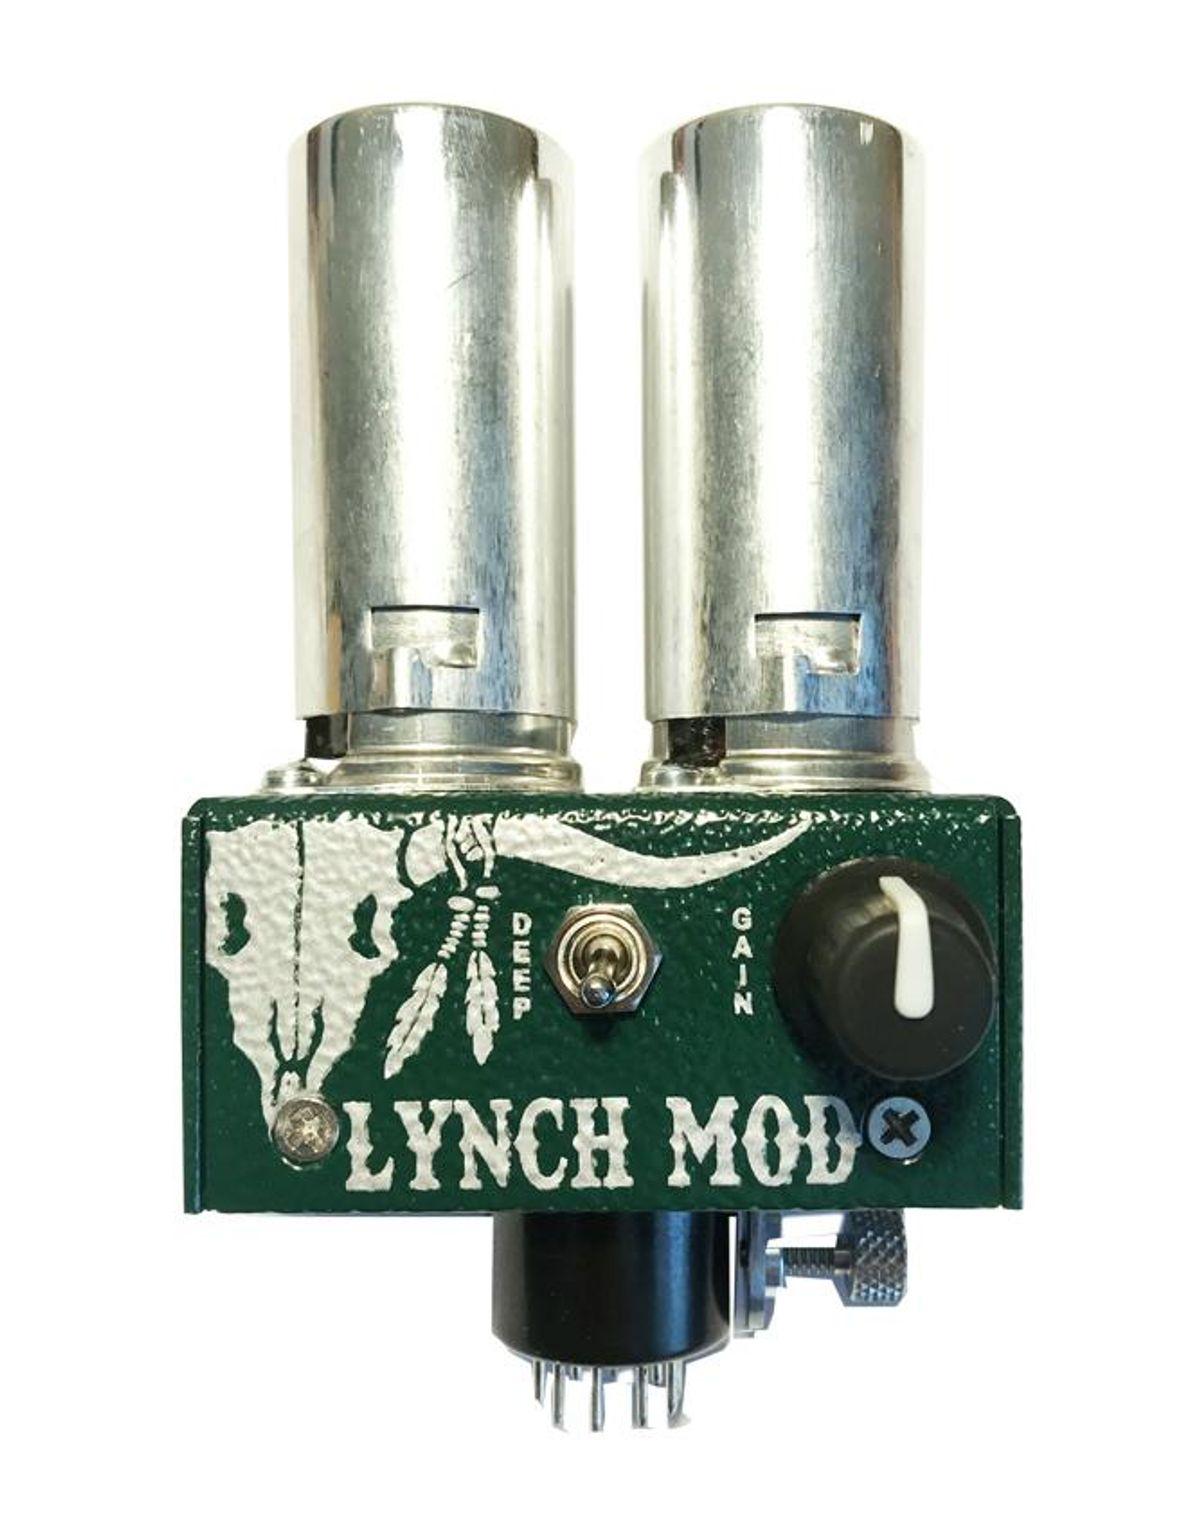 LegendaryTones Unleashes the Lynch Mod